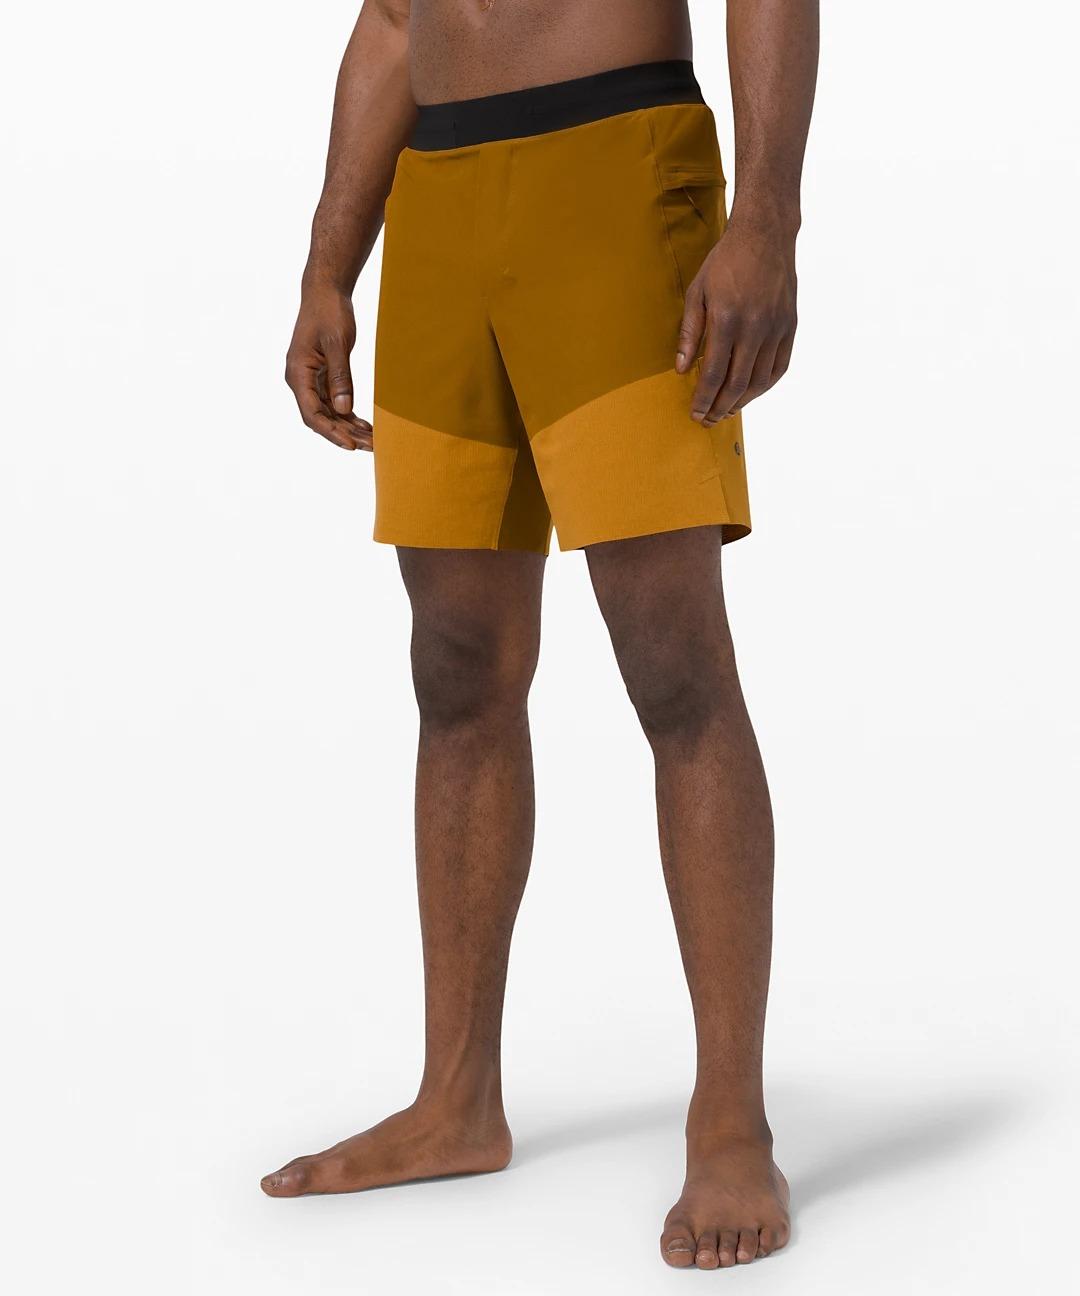 lululemon black friday deals -Train to Beach Short (brown and orange shorts)